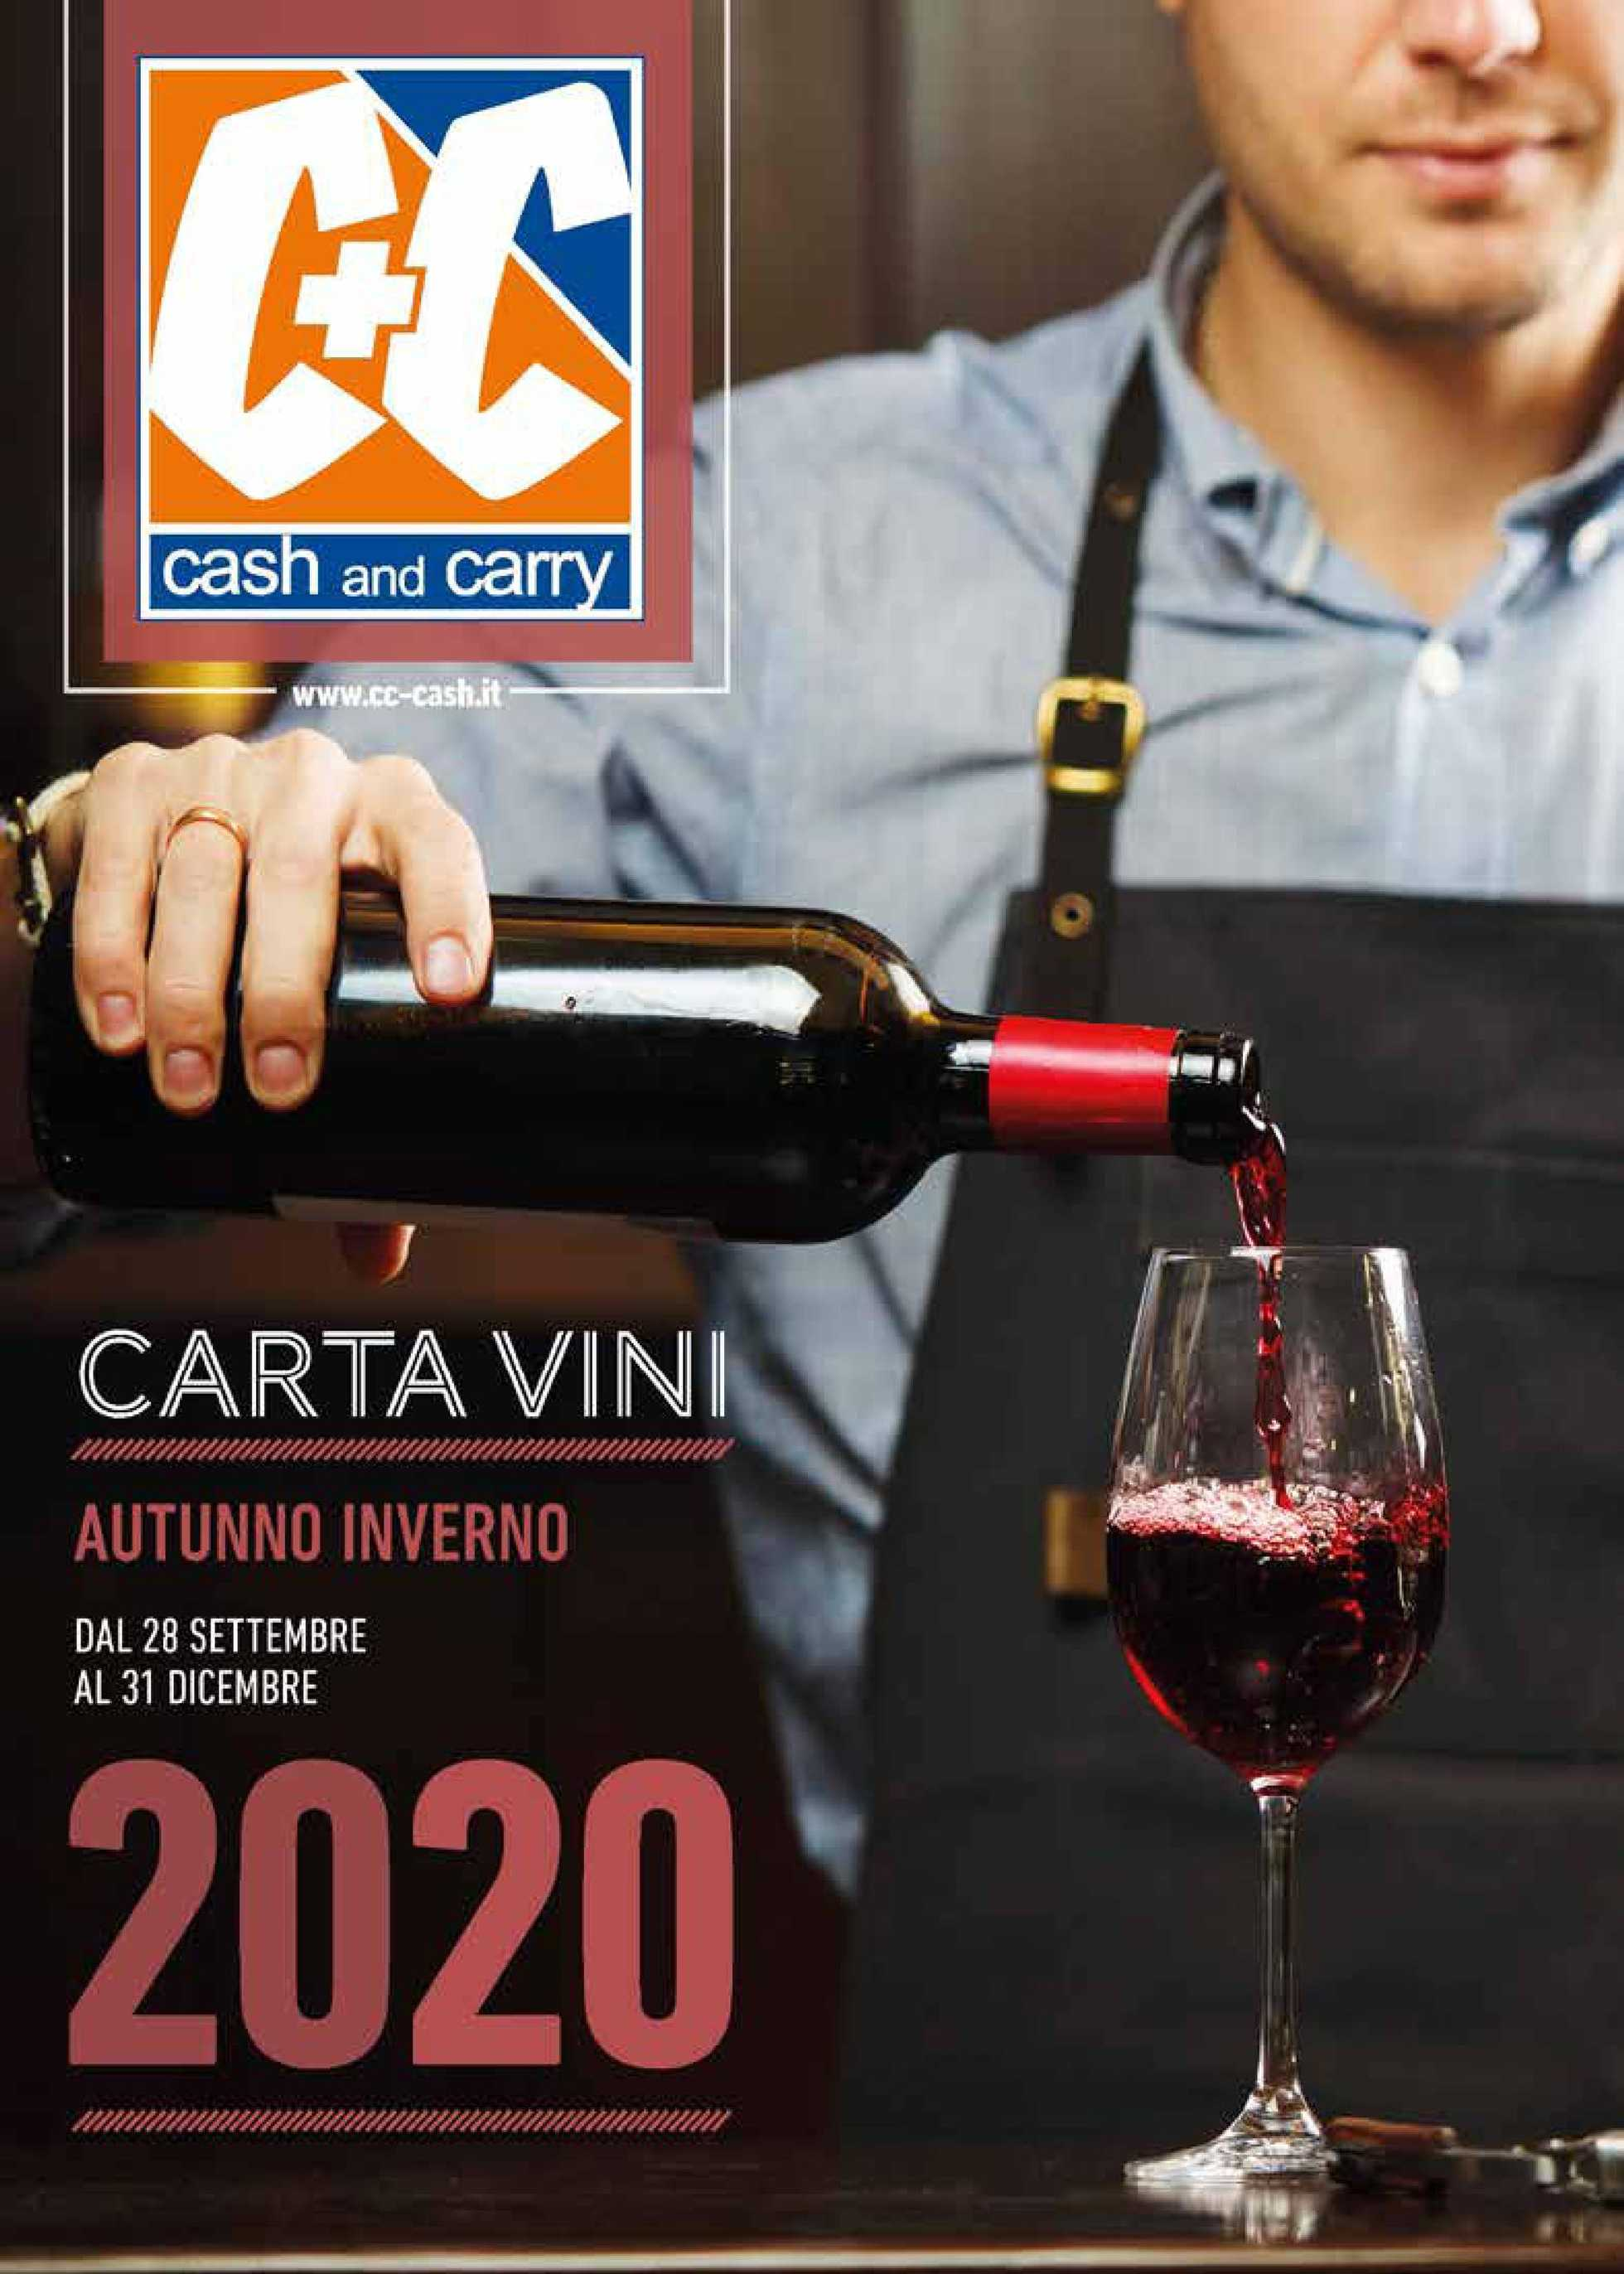 C+C Cash and Carry - offerte valide dal 28.09.2020 al 31.12.2020 - pagina 1.